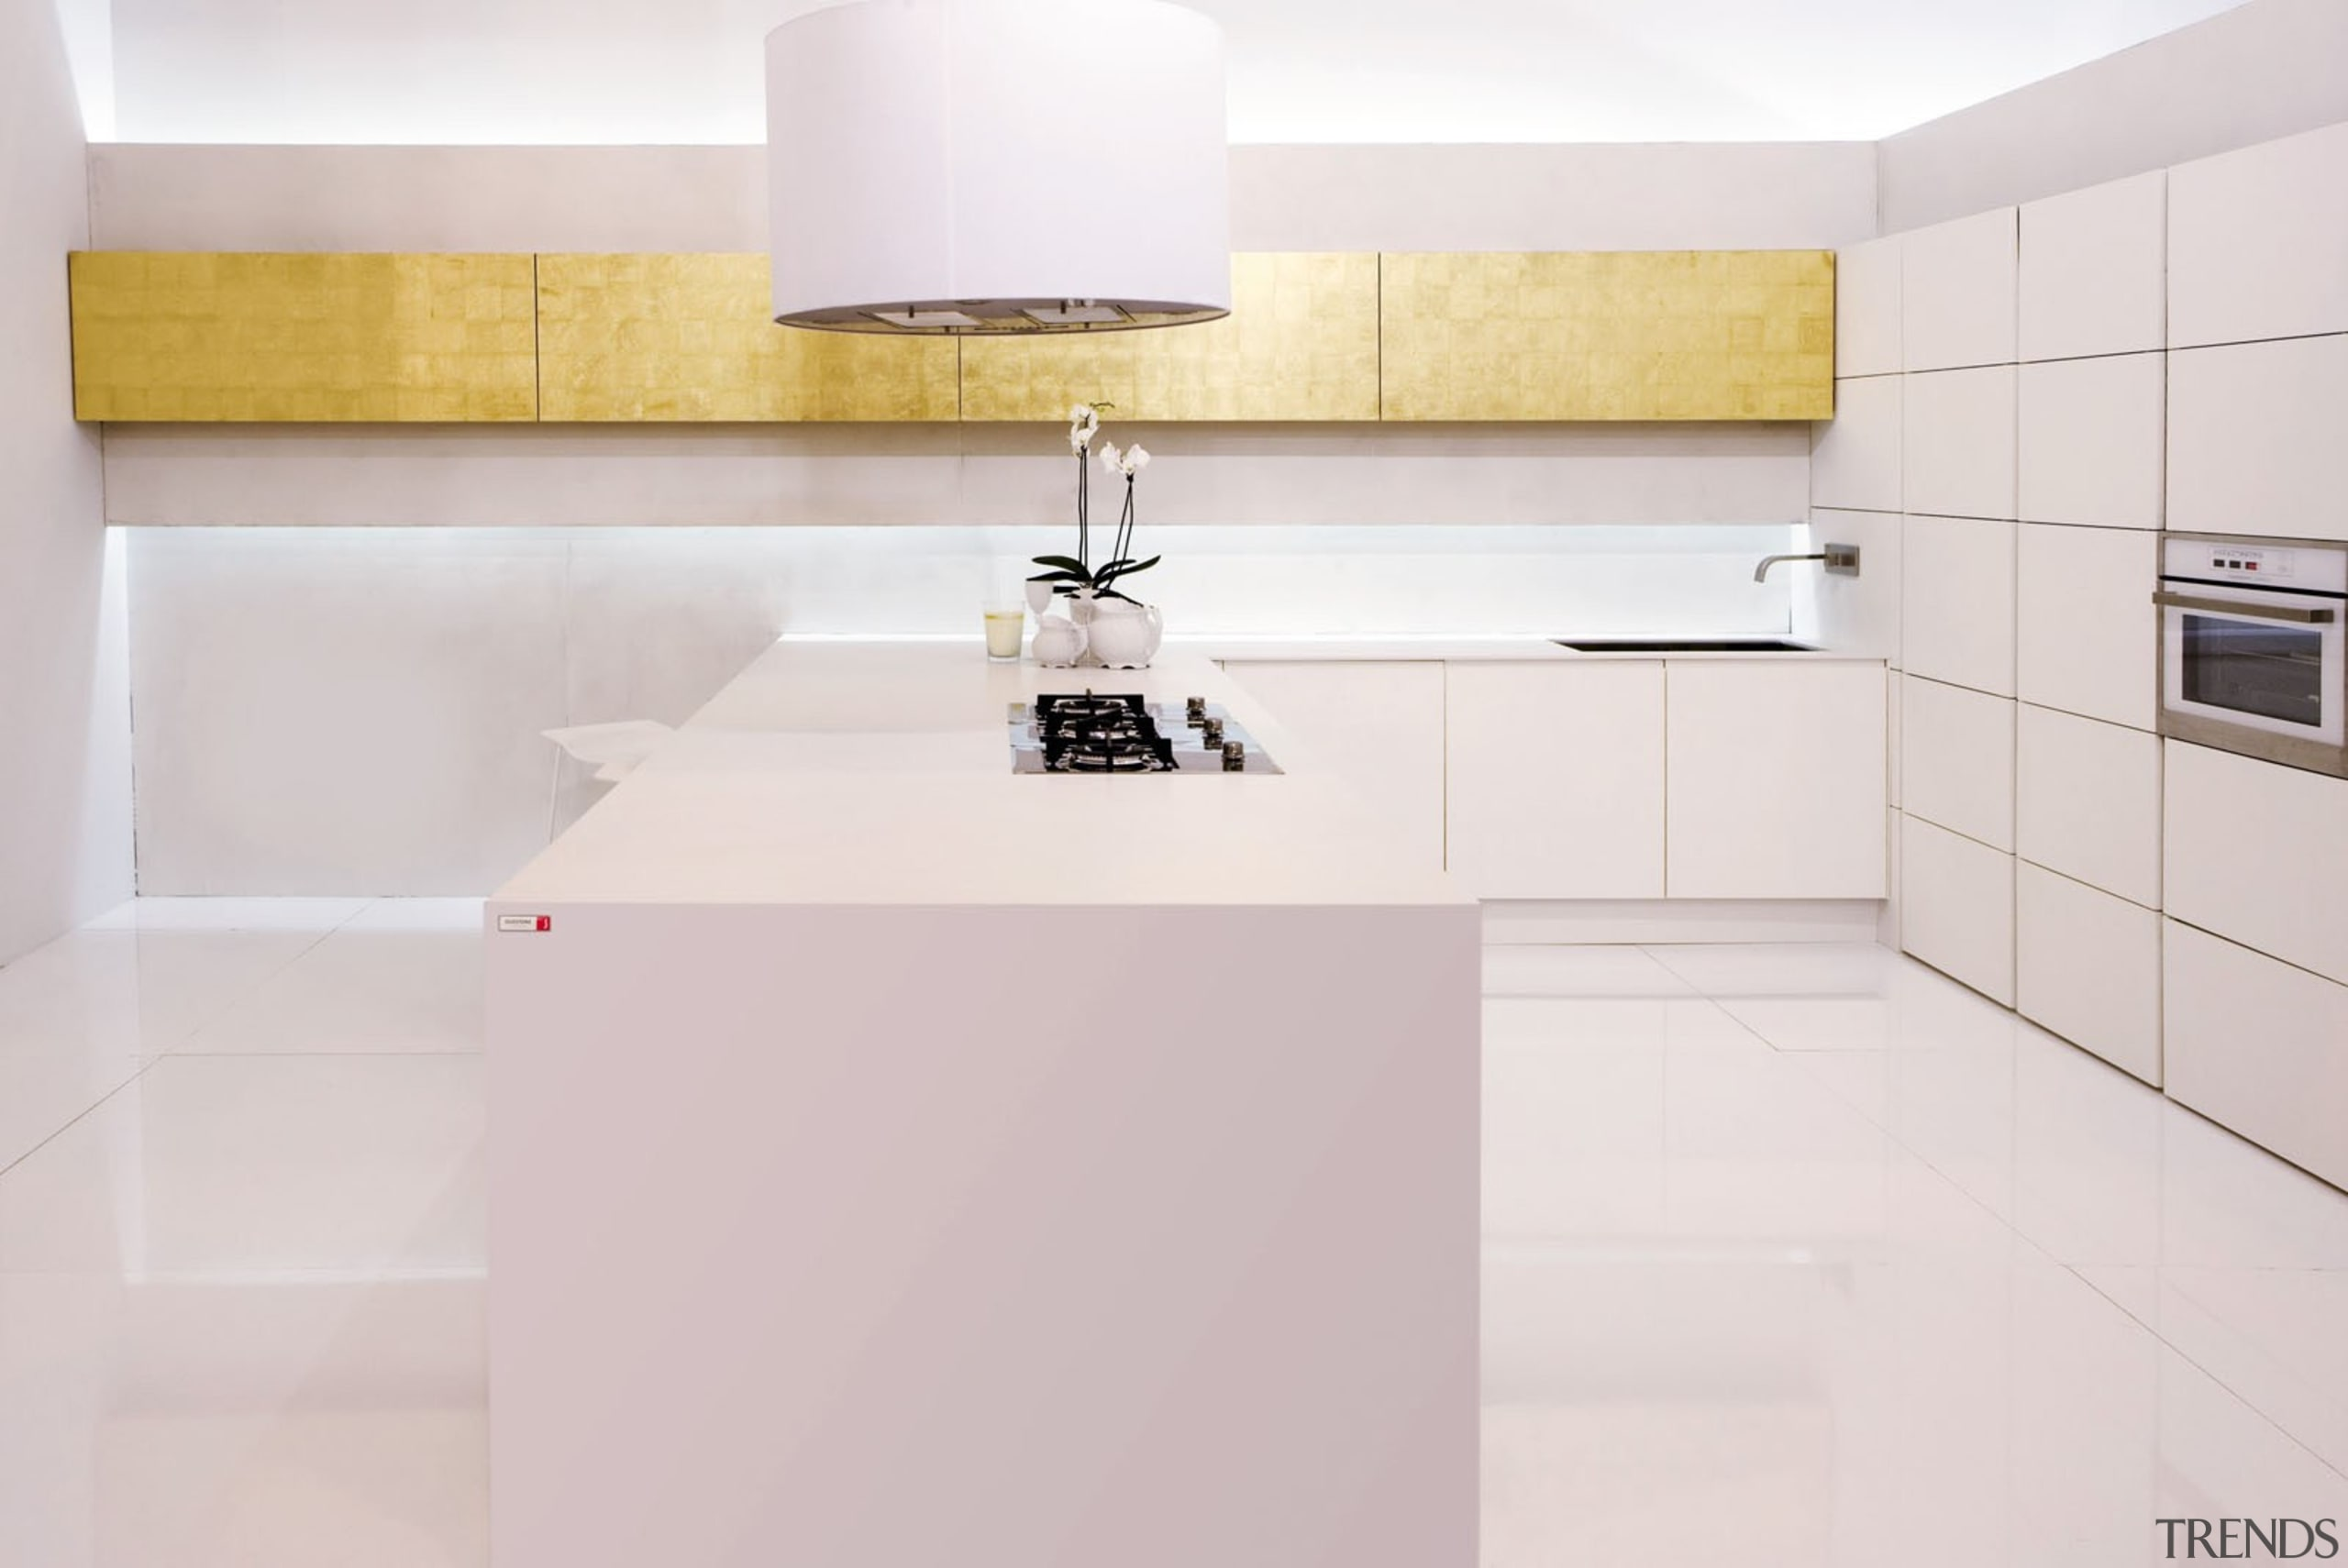 Blanco Zeus - Blanco Zeus - cabinetry   cabinetry, countertop, floor, flooring, interior design, kitchen, product design, property, room, sink, tap, tile, white